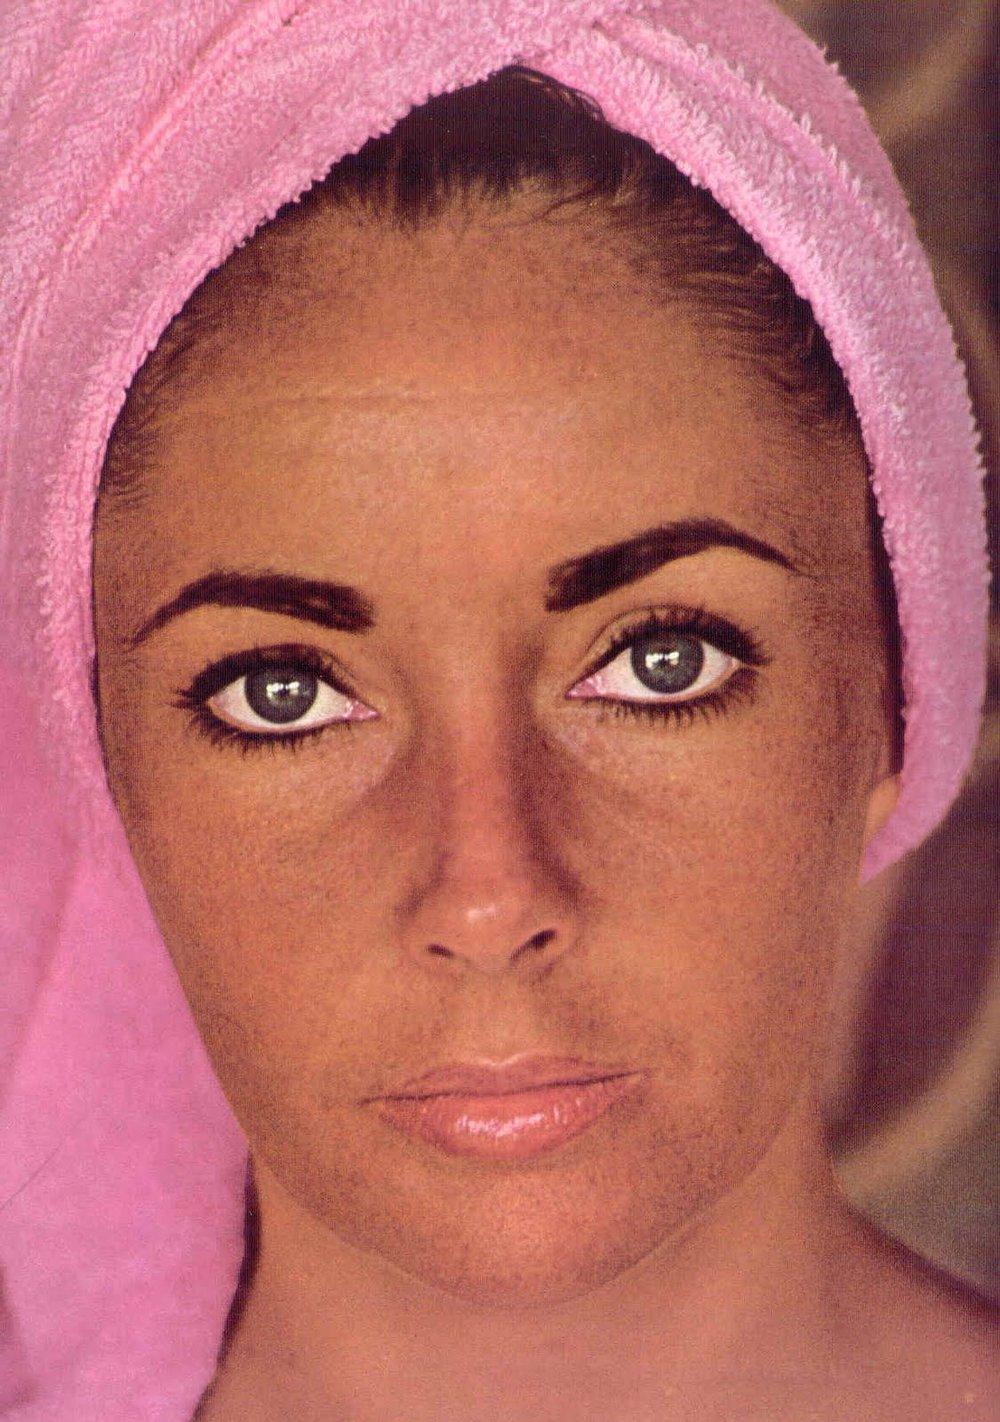 elizabeth-taylor-pink-towel.jpg